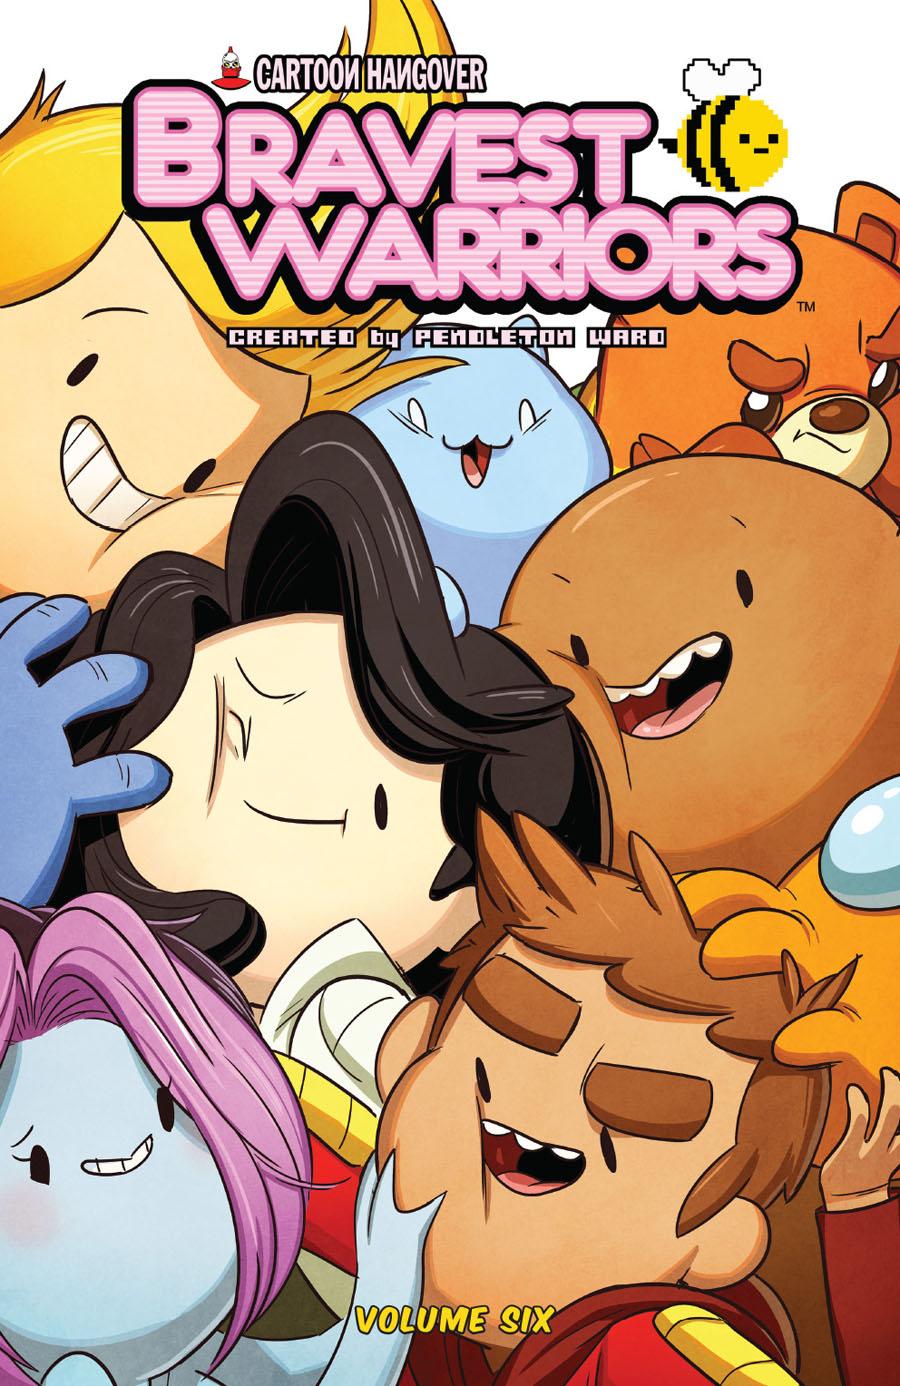 Bravest Warriors Vol 6 TP